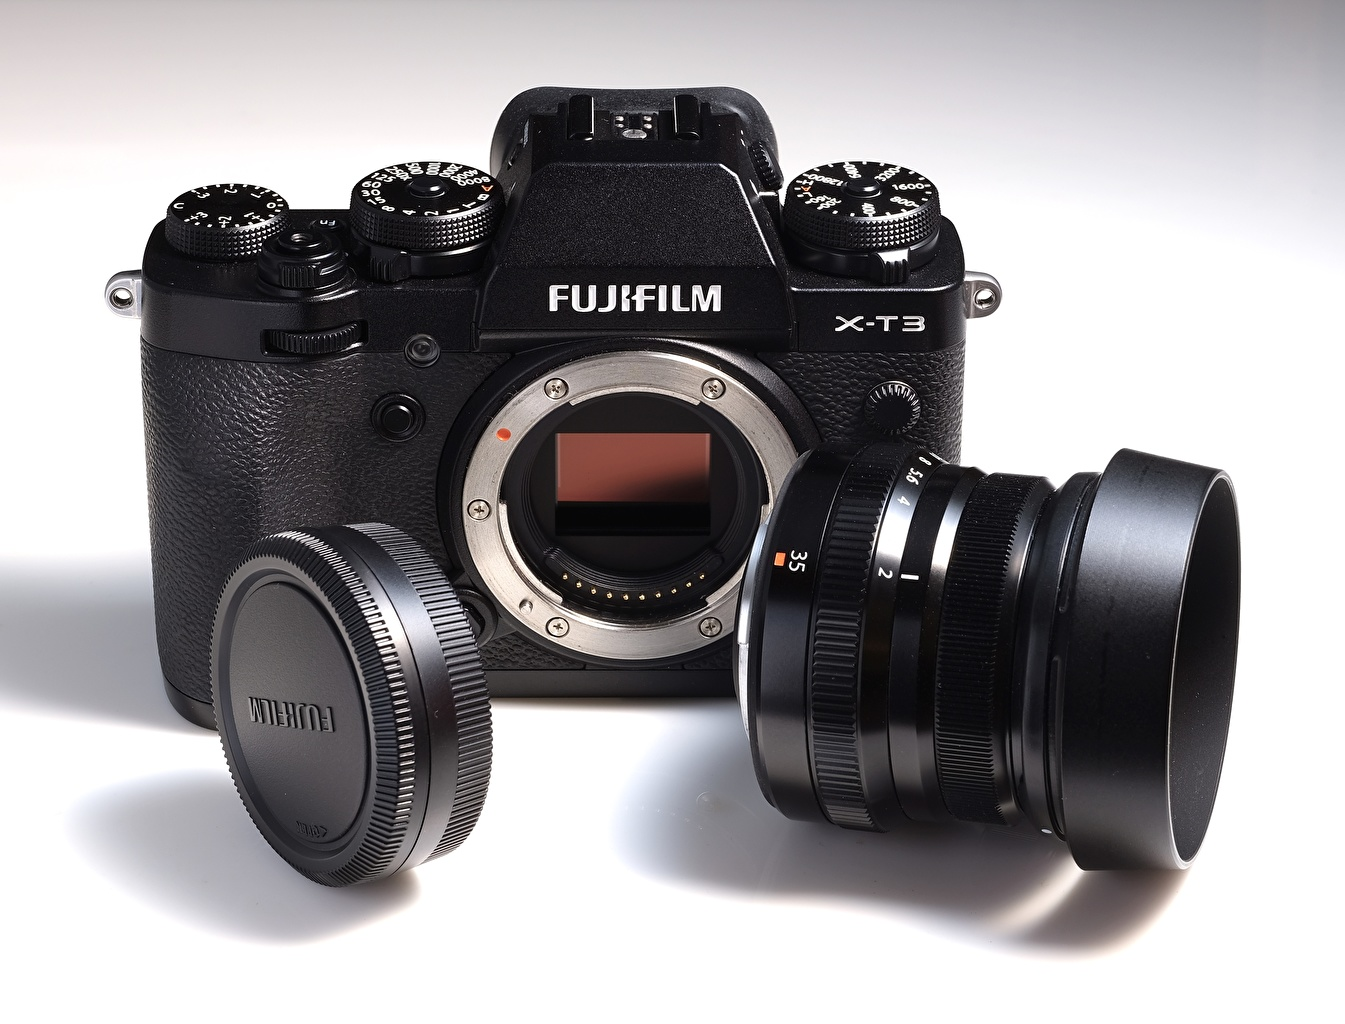 Картинка Объектив фотокамера FUJIFILM, X-T3 Крупным планом Фотоаппарат вблизи